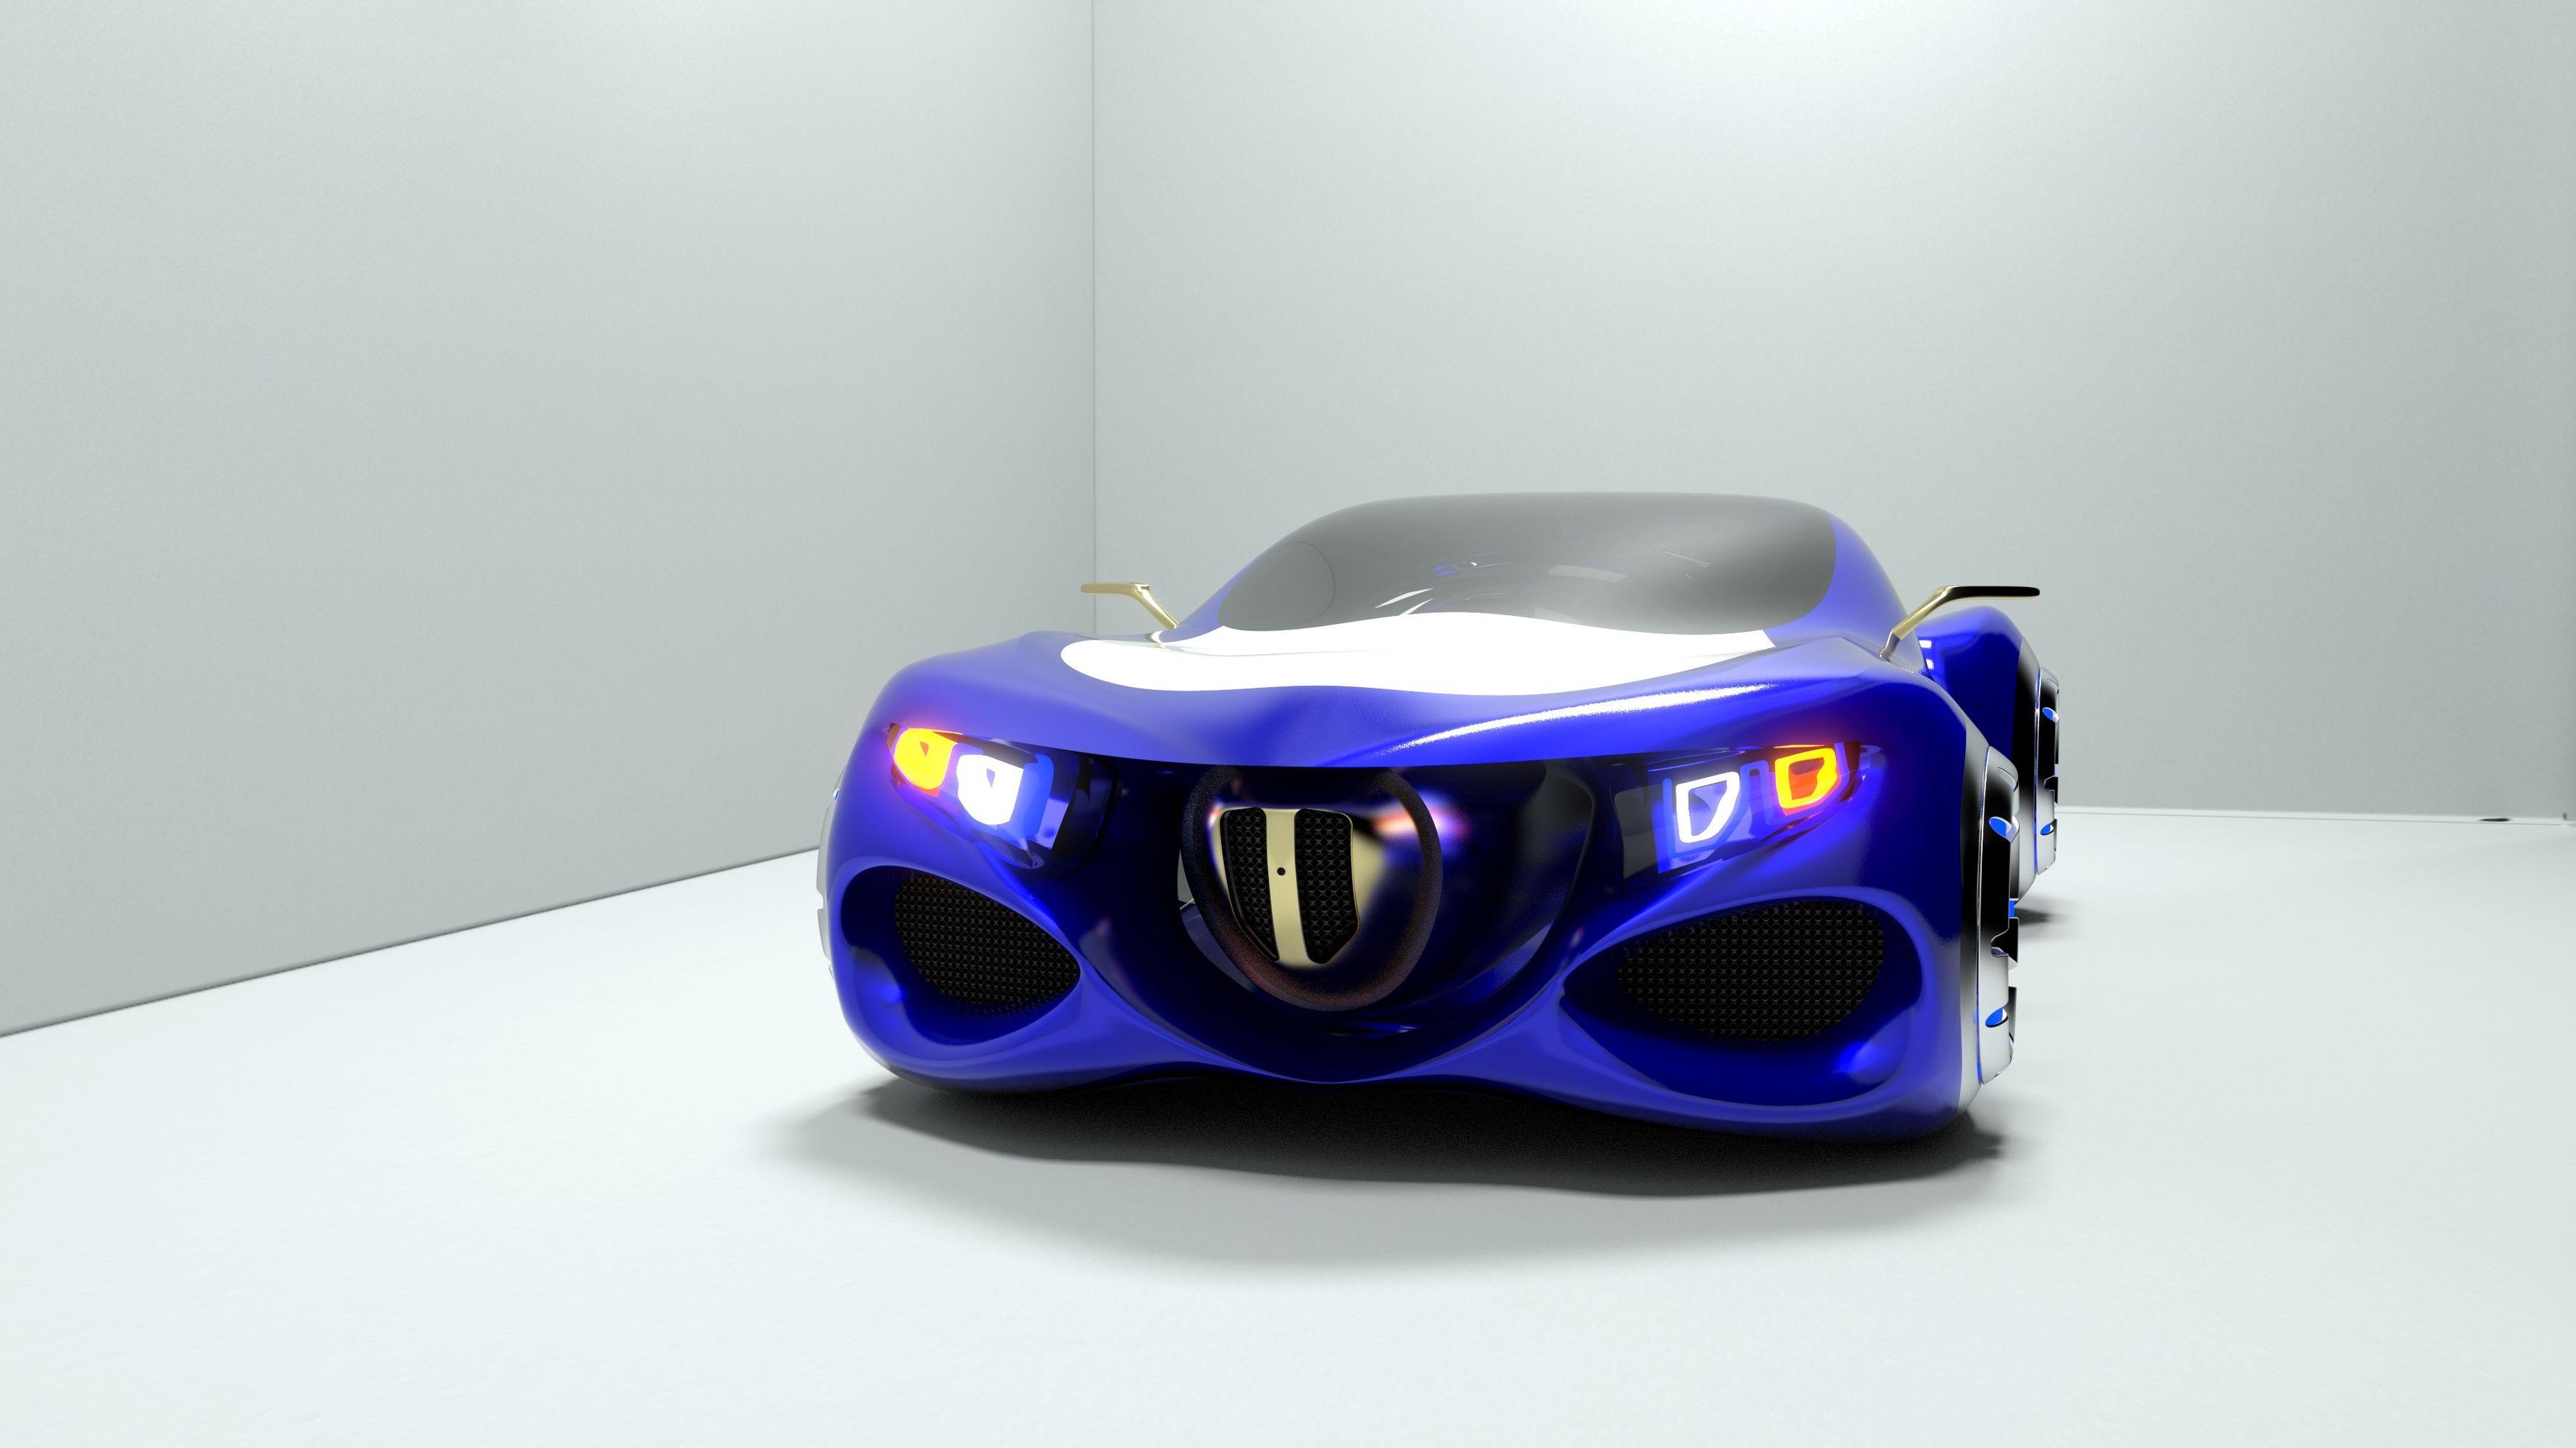 Vox-3-3500-3500